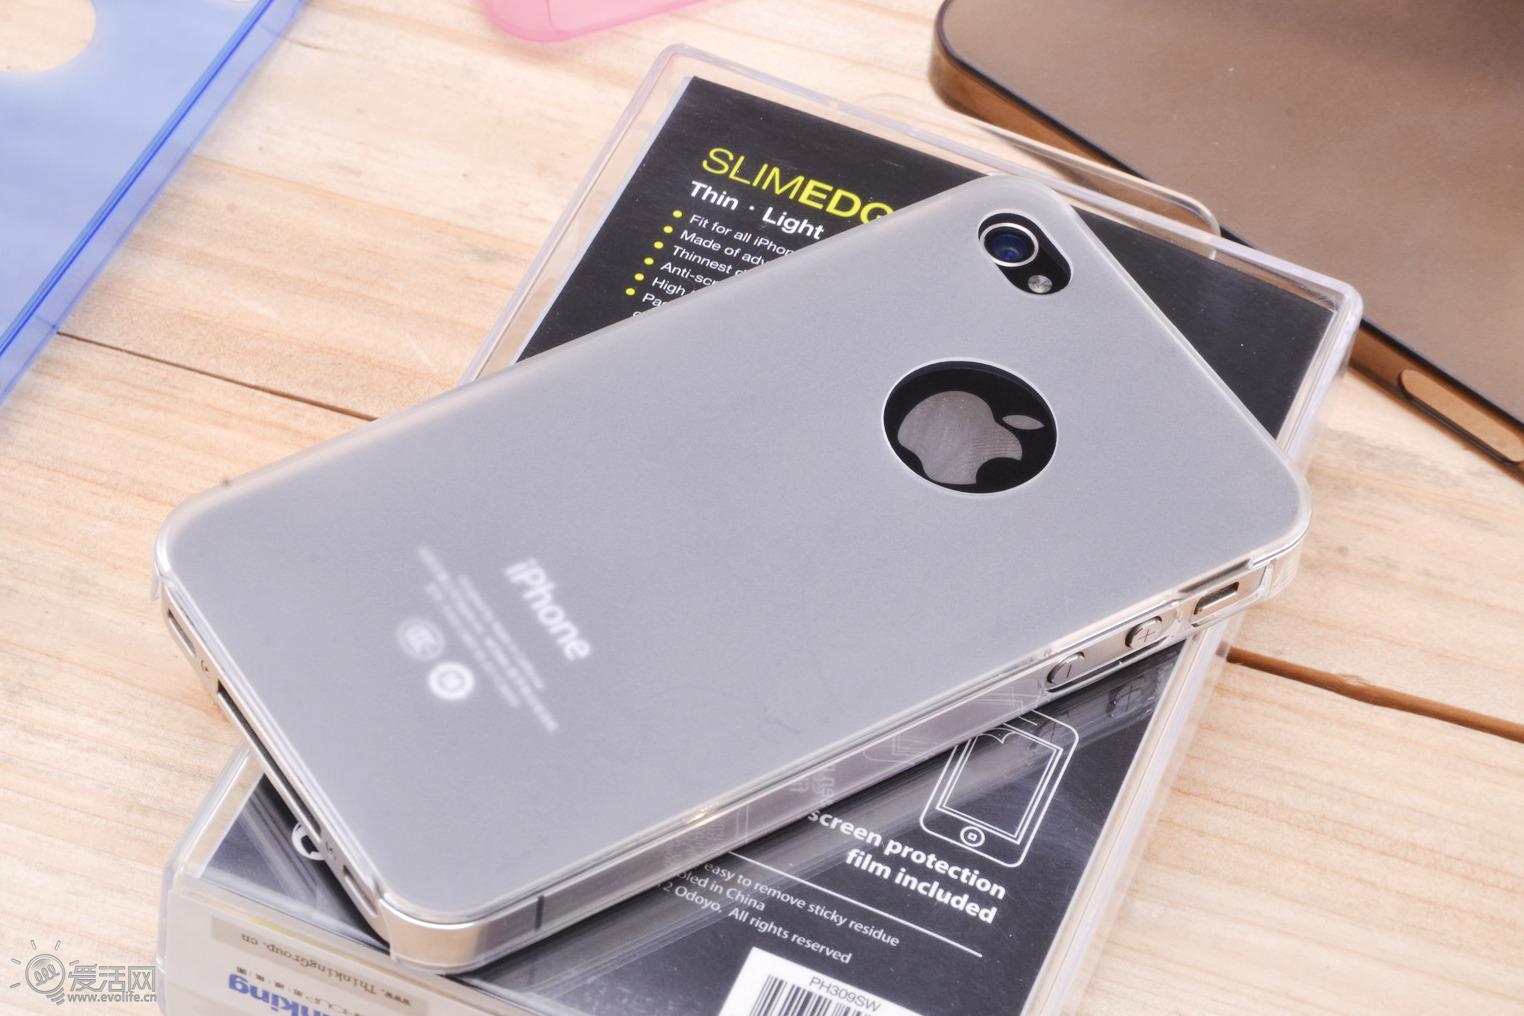 iphone音量键松动_若隐若现迷人眼 ODOYO Slim Edge iPhone4S保护套试玩 - 推酷